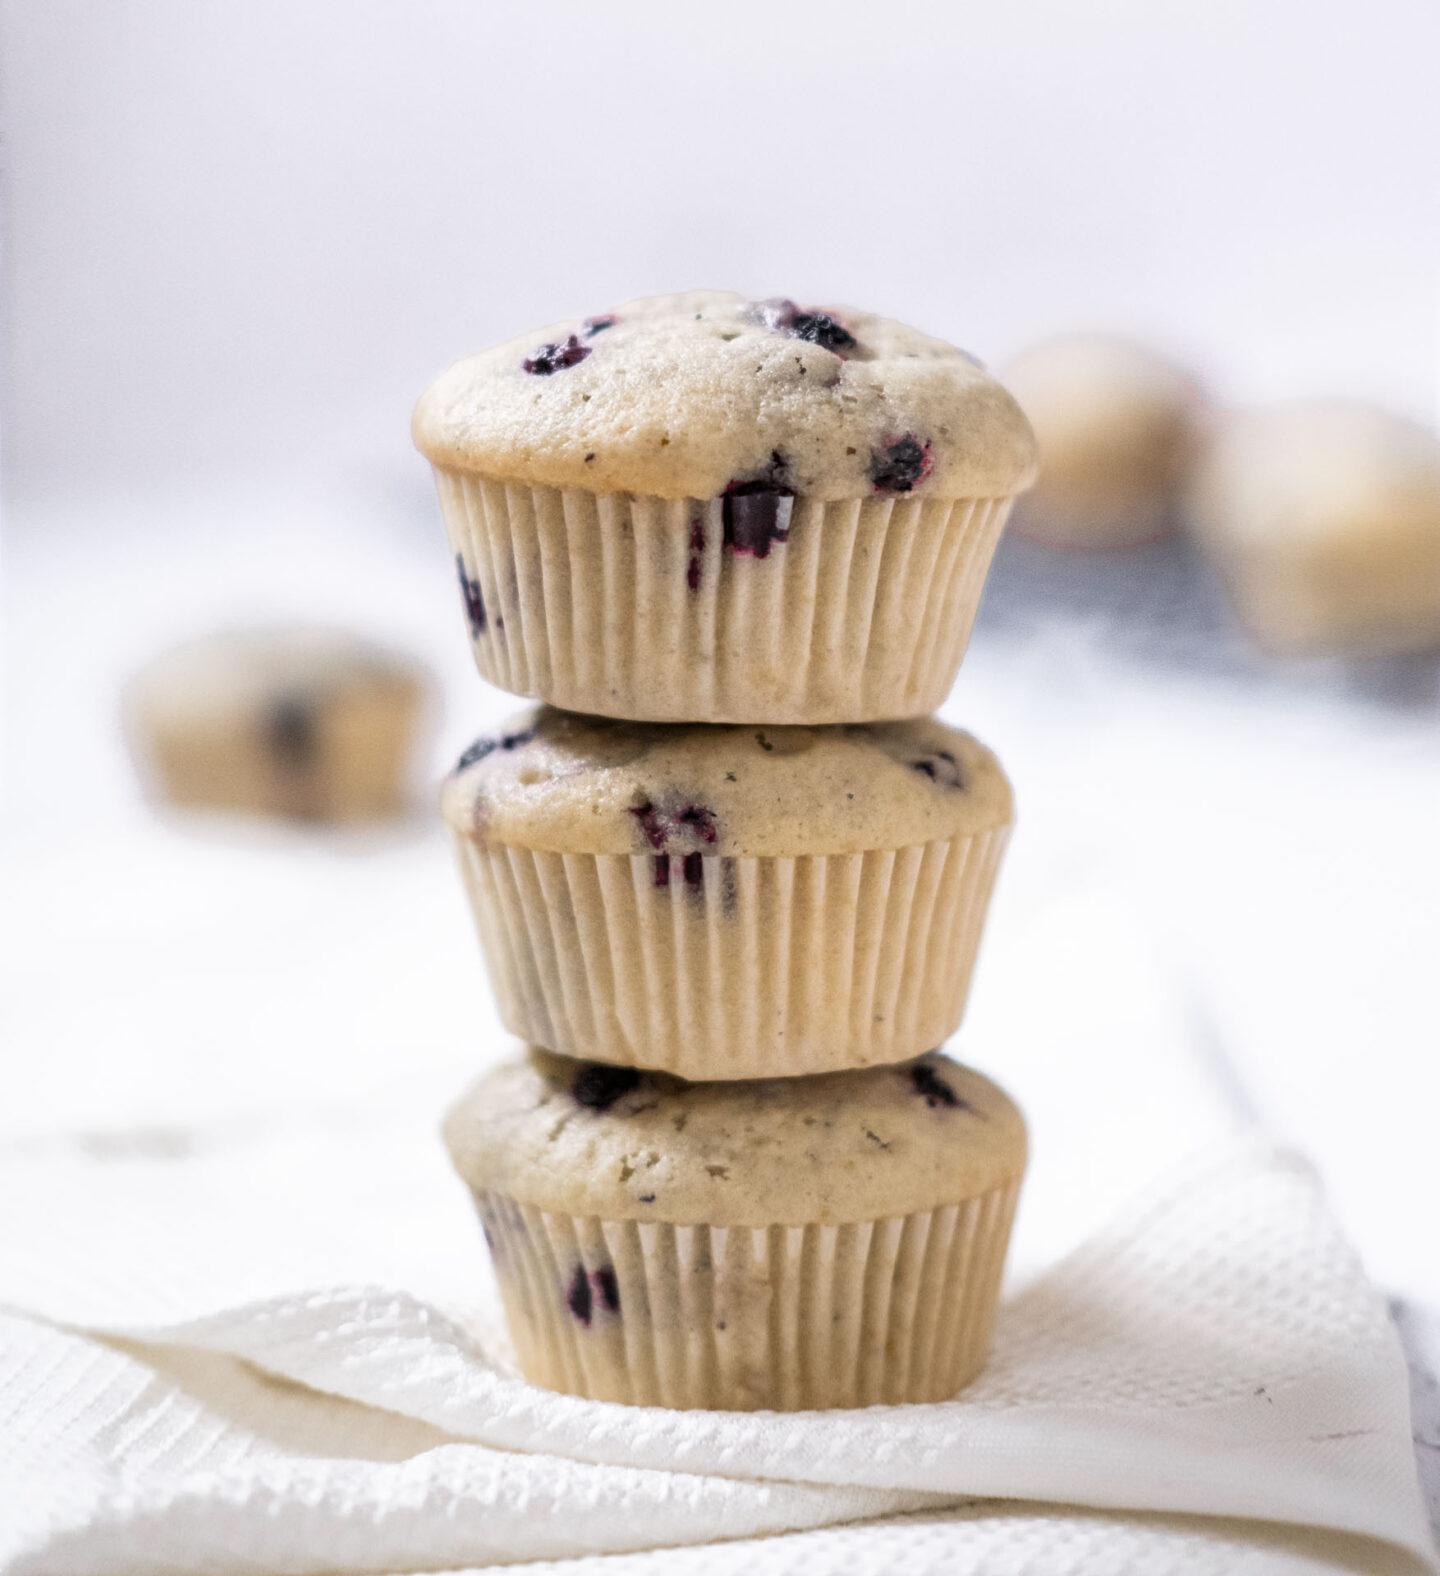 Veganska muffins recept blåbärsmuffins